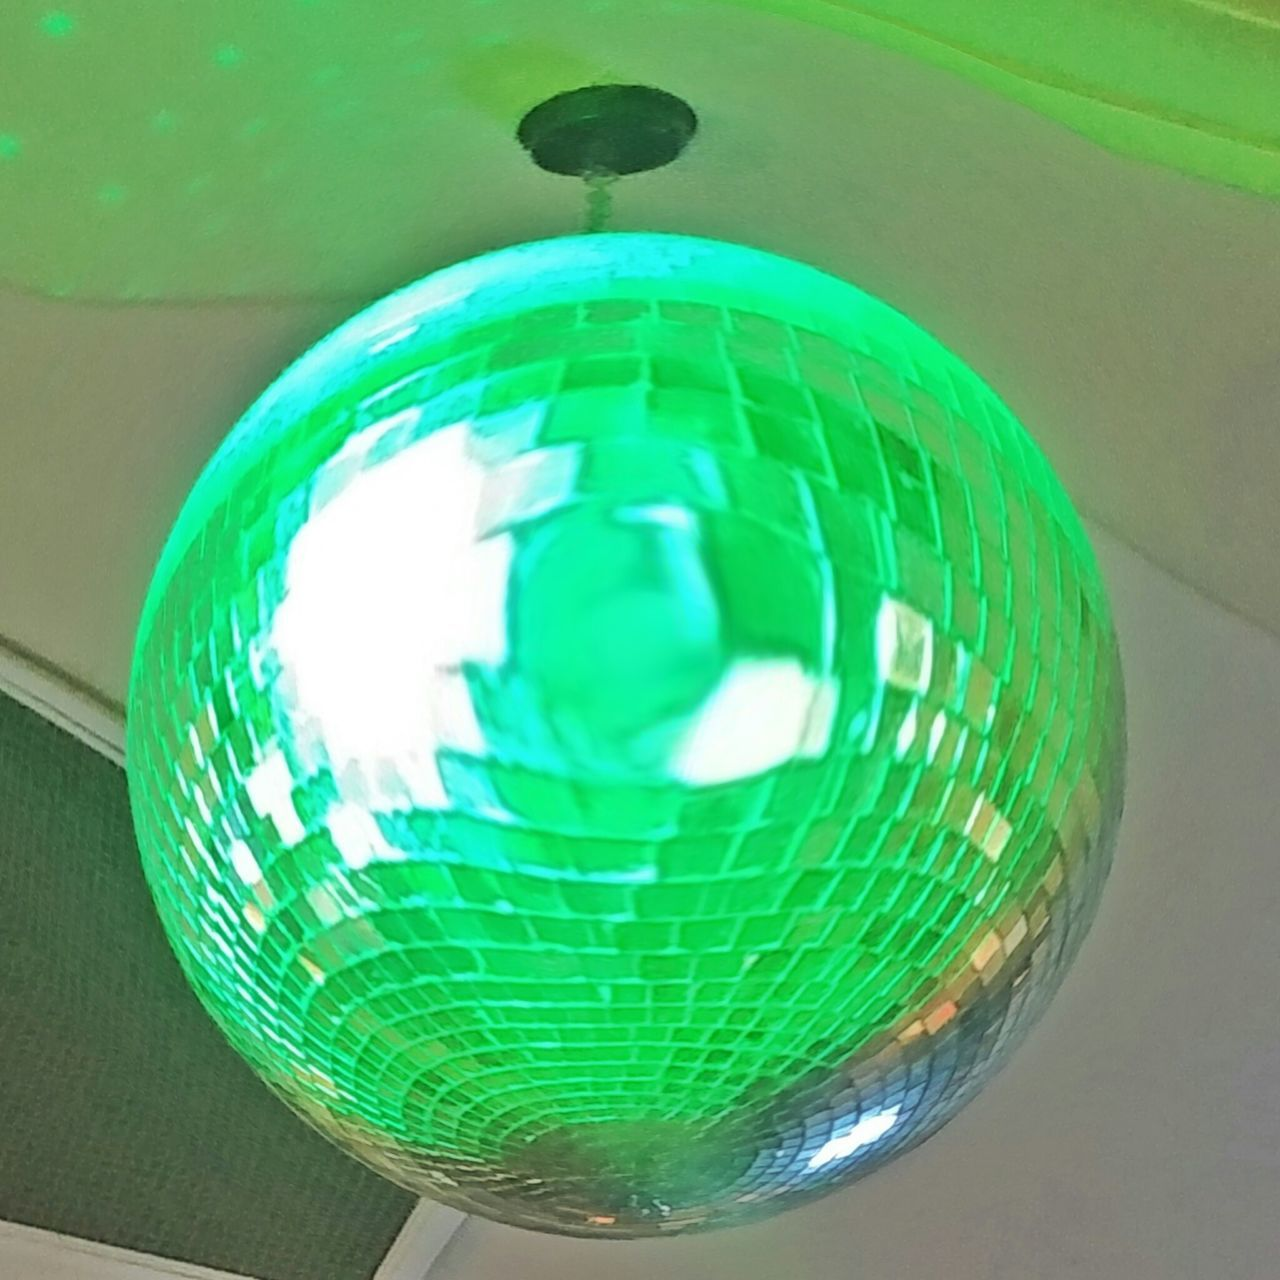 Prettygreen Disco Ball Lightporn BestEyeemShots Picoftheday